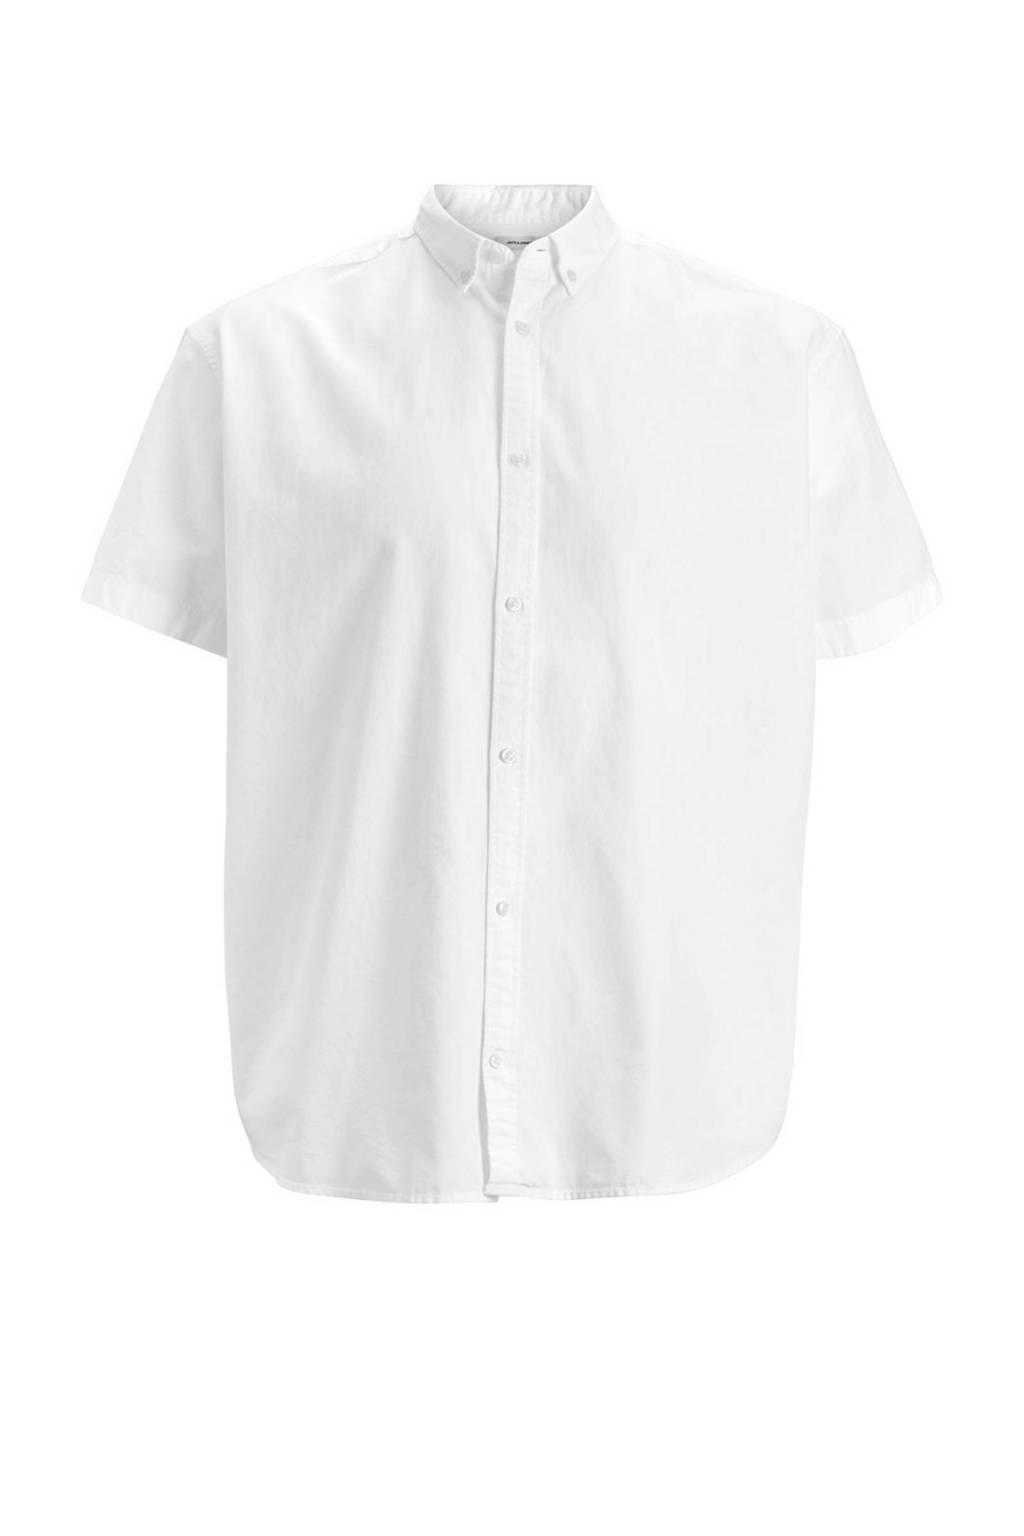 Jack & Jones Plus Size overhemd wit, Wit